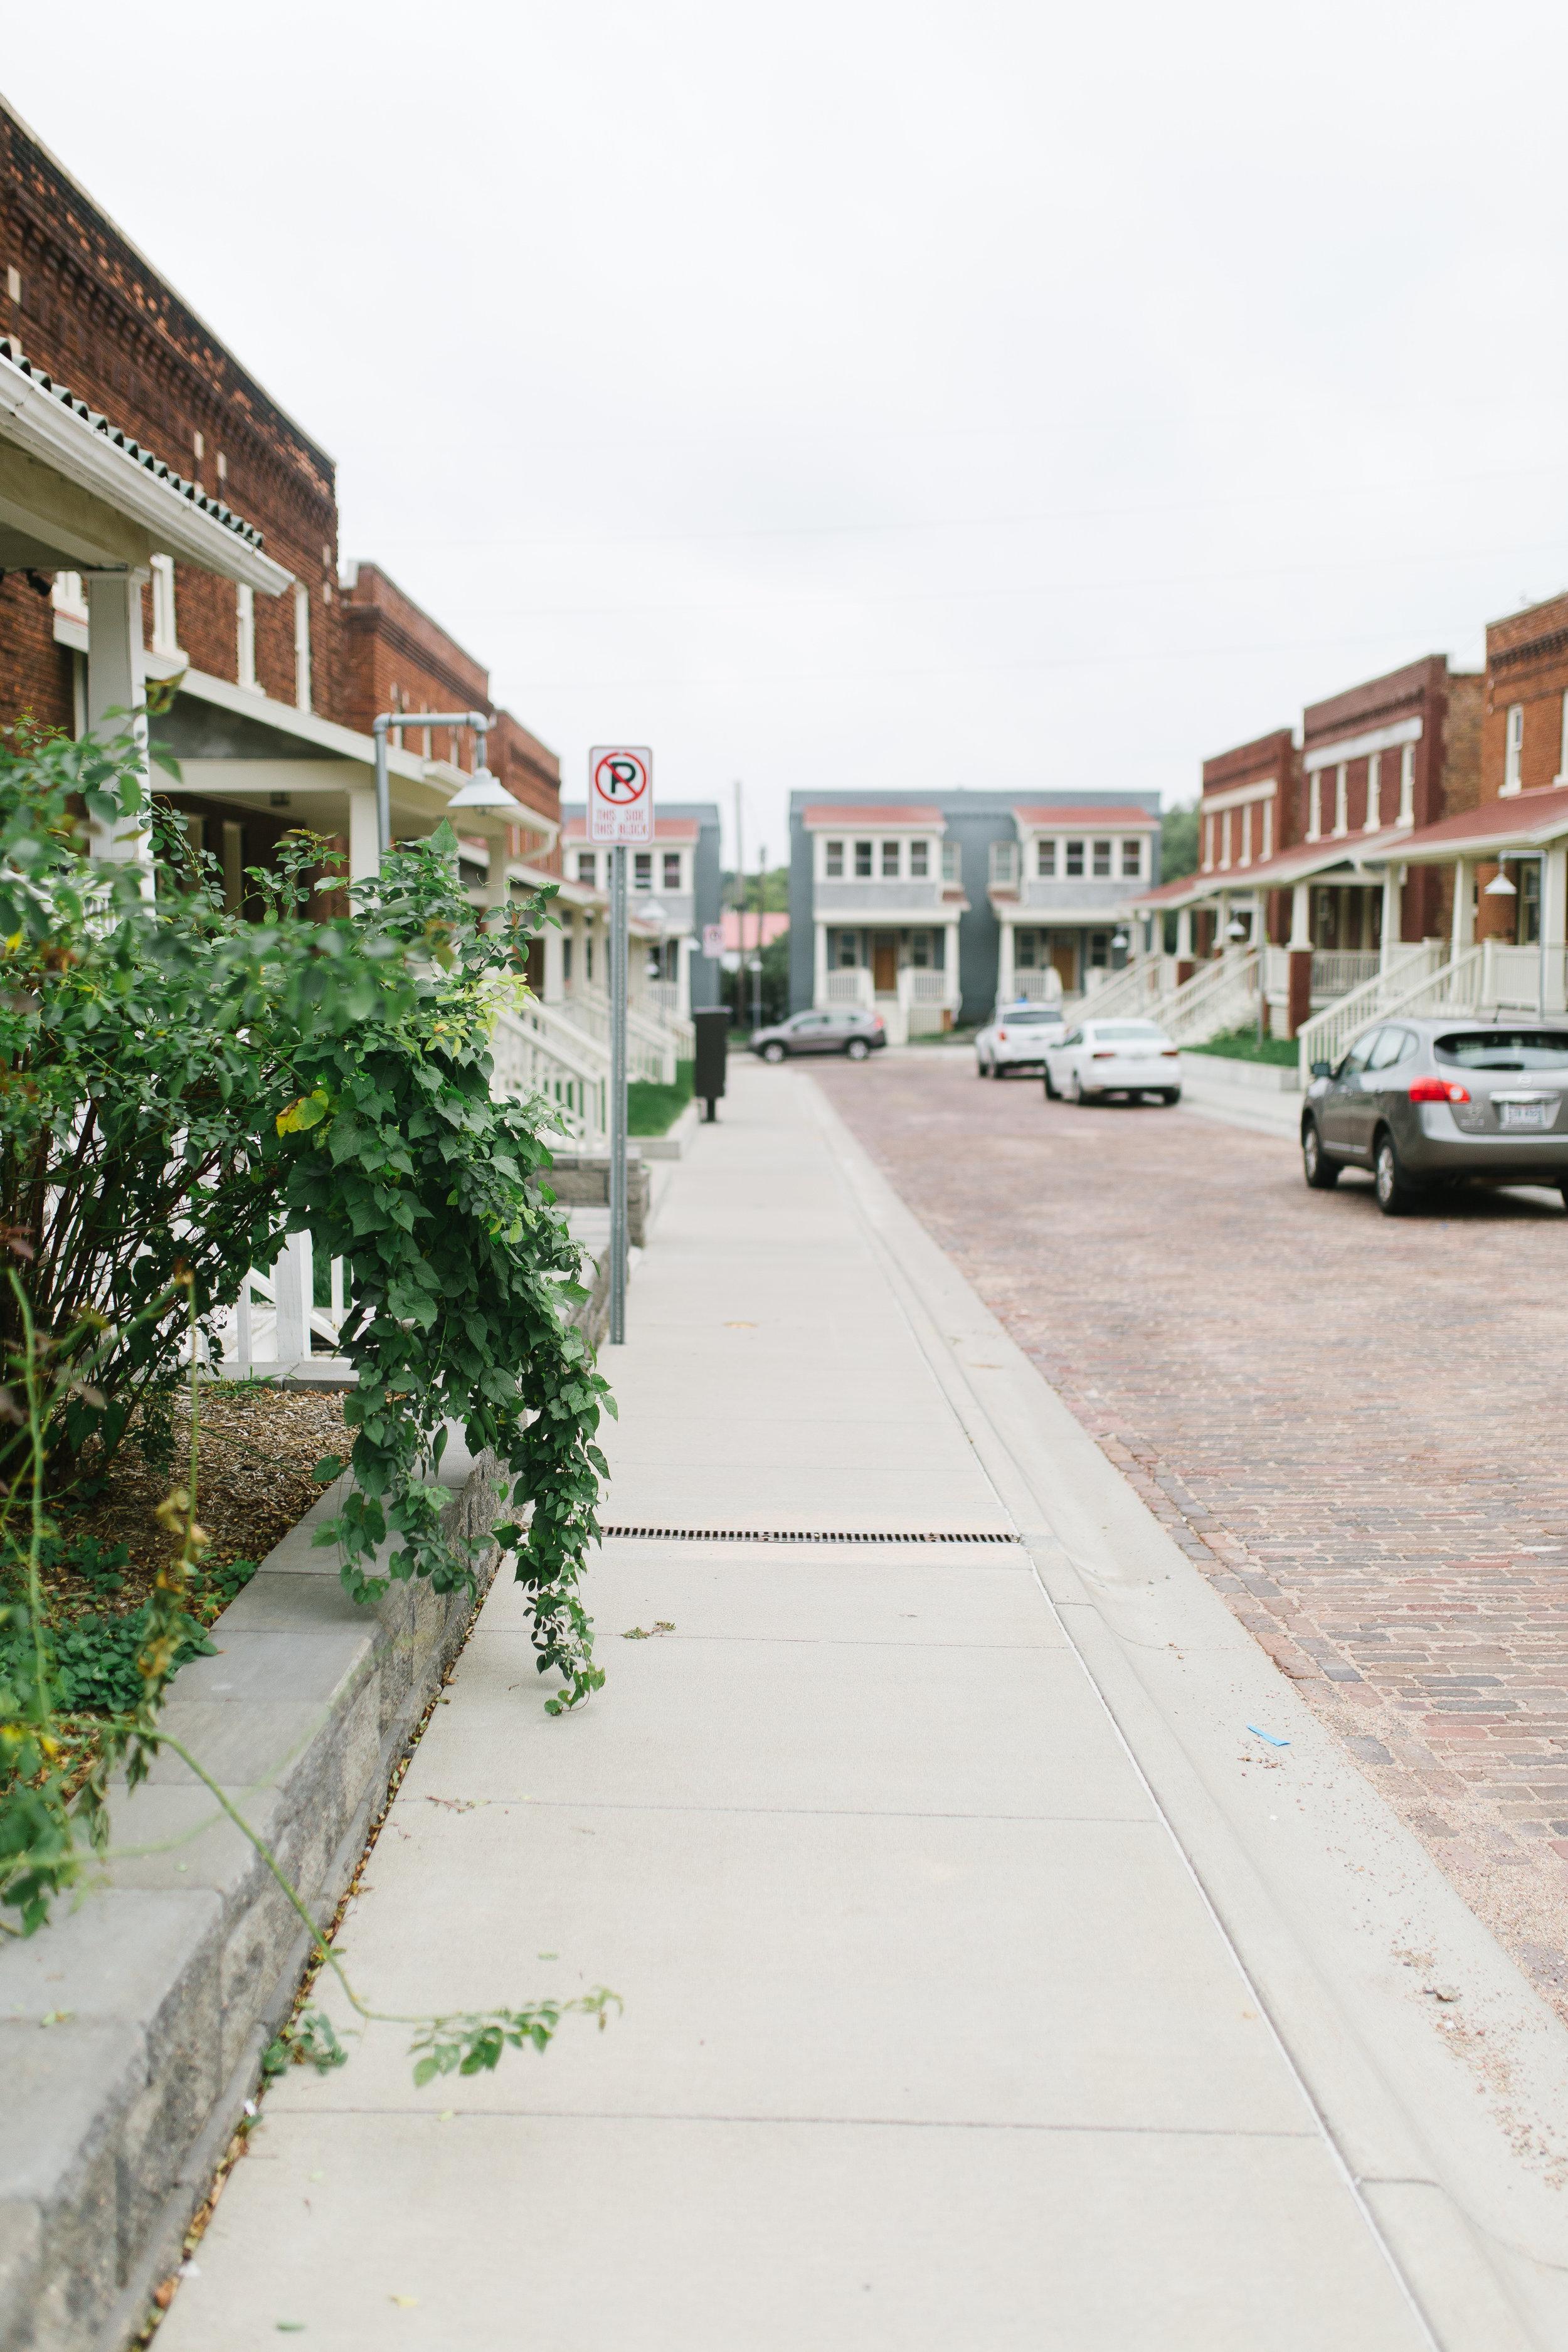 Travers row apartments -